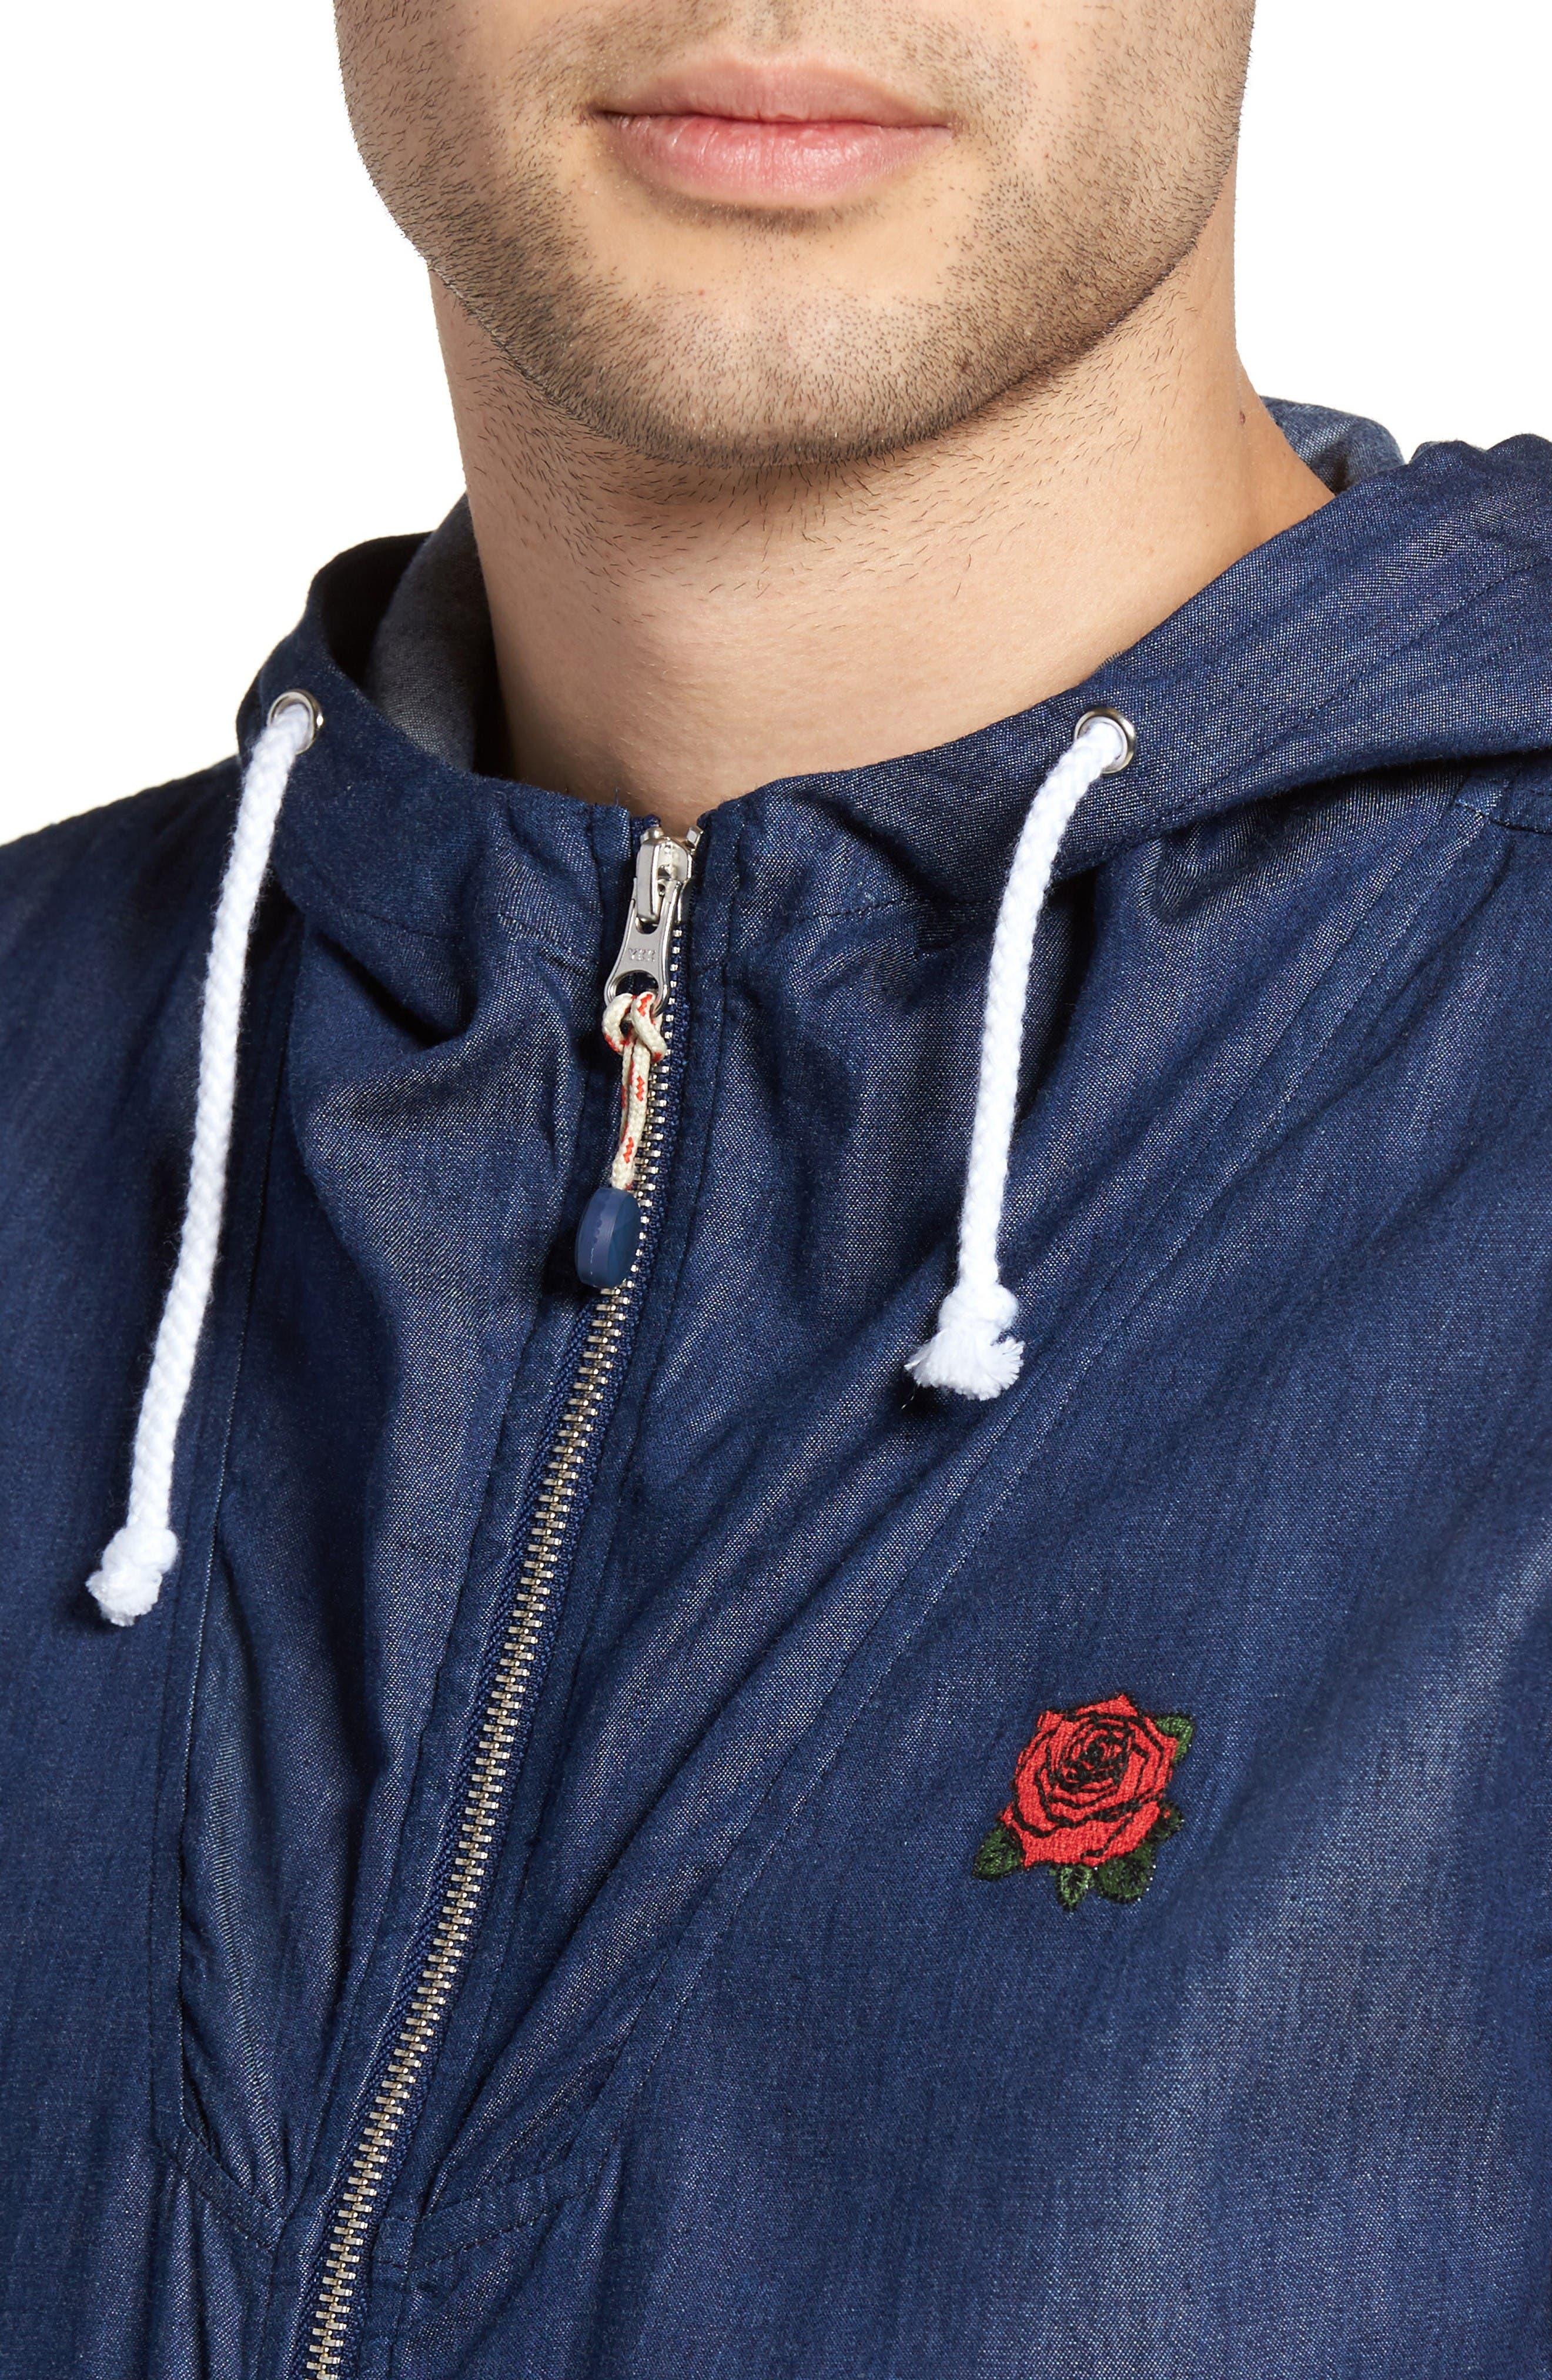 Flower District Hooded Zip Denim Jacket,                             Alternate thumbnail 4, color,                             Indigo